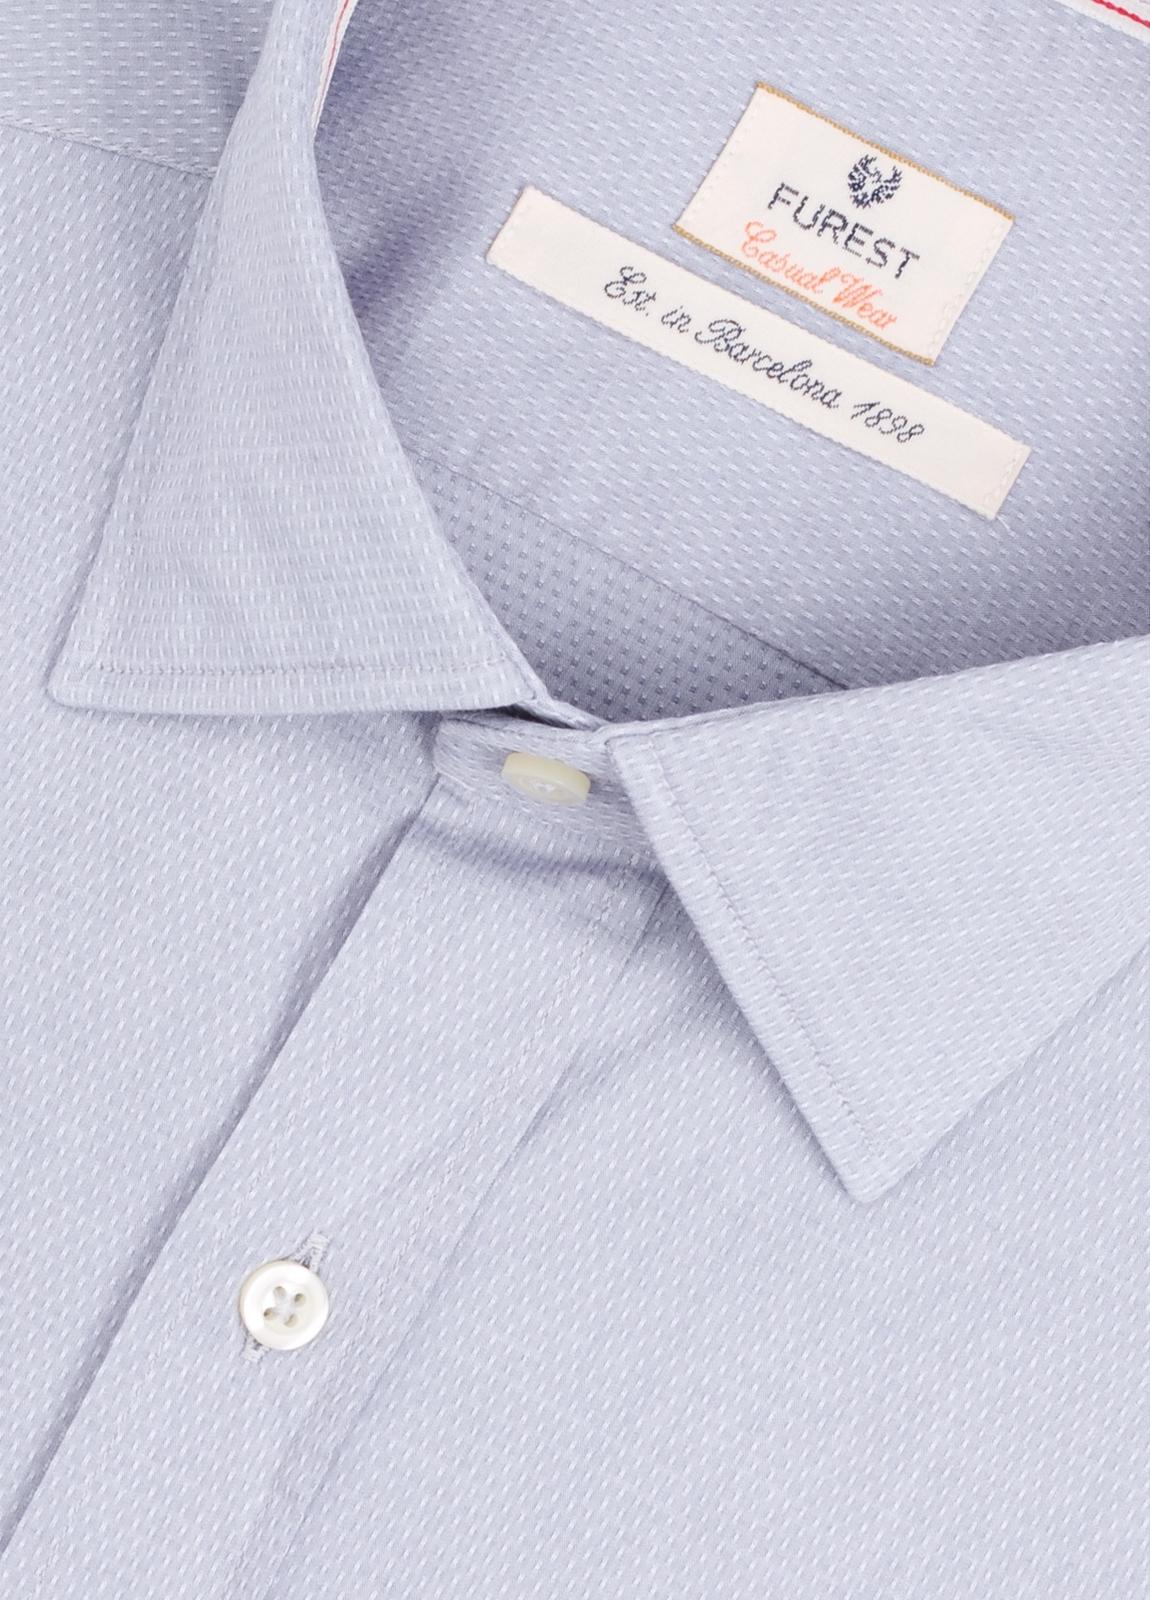 Camisa Casual Wear SLIM FIT Modelo PORTO micro textura color gris. 100% Algodón. - Ítem1